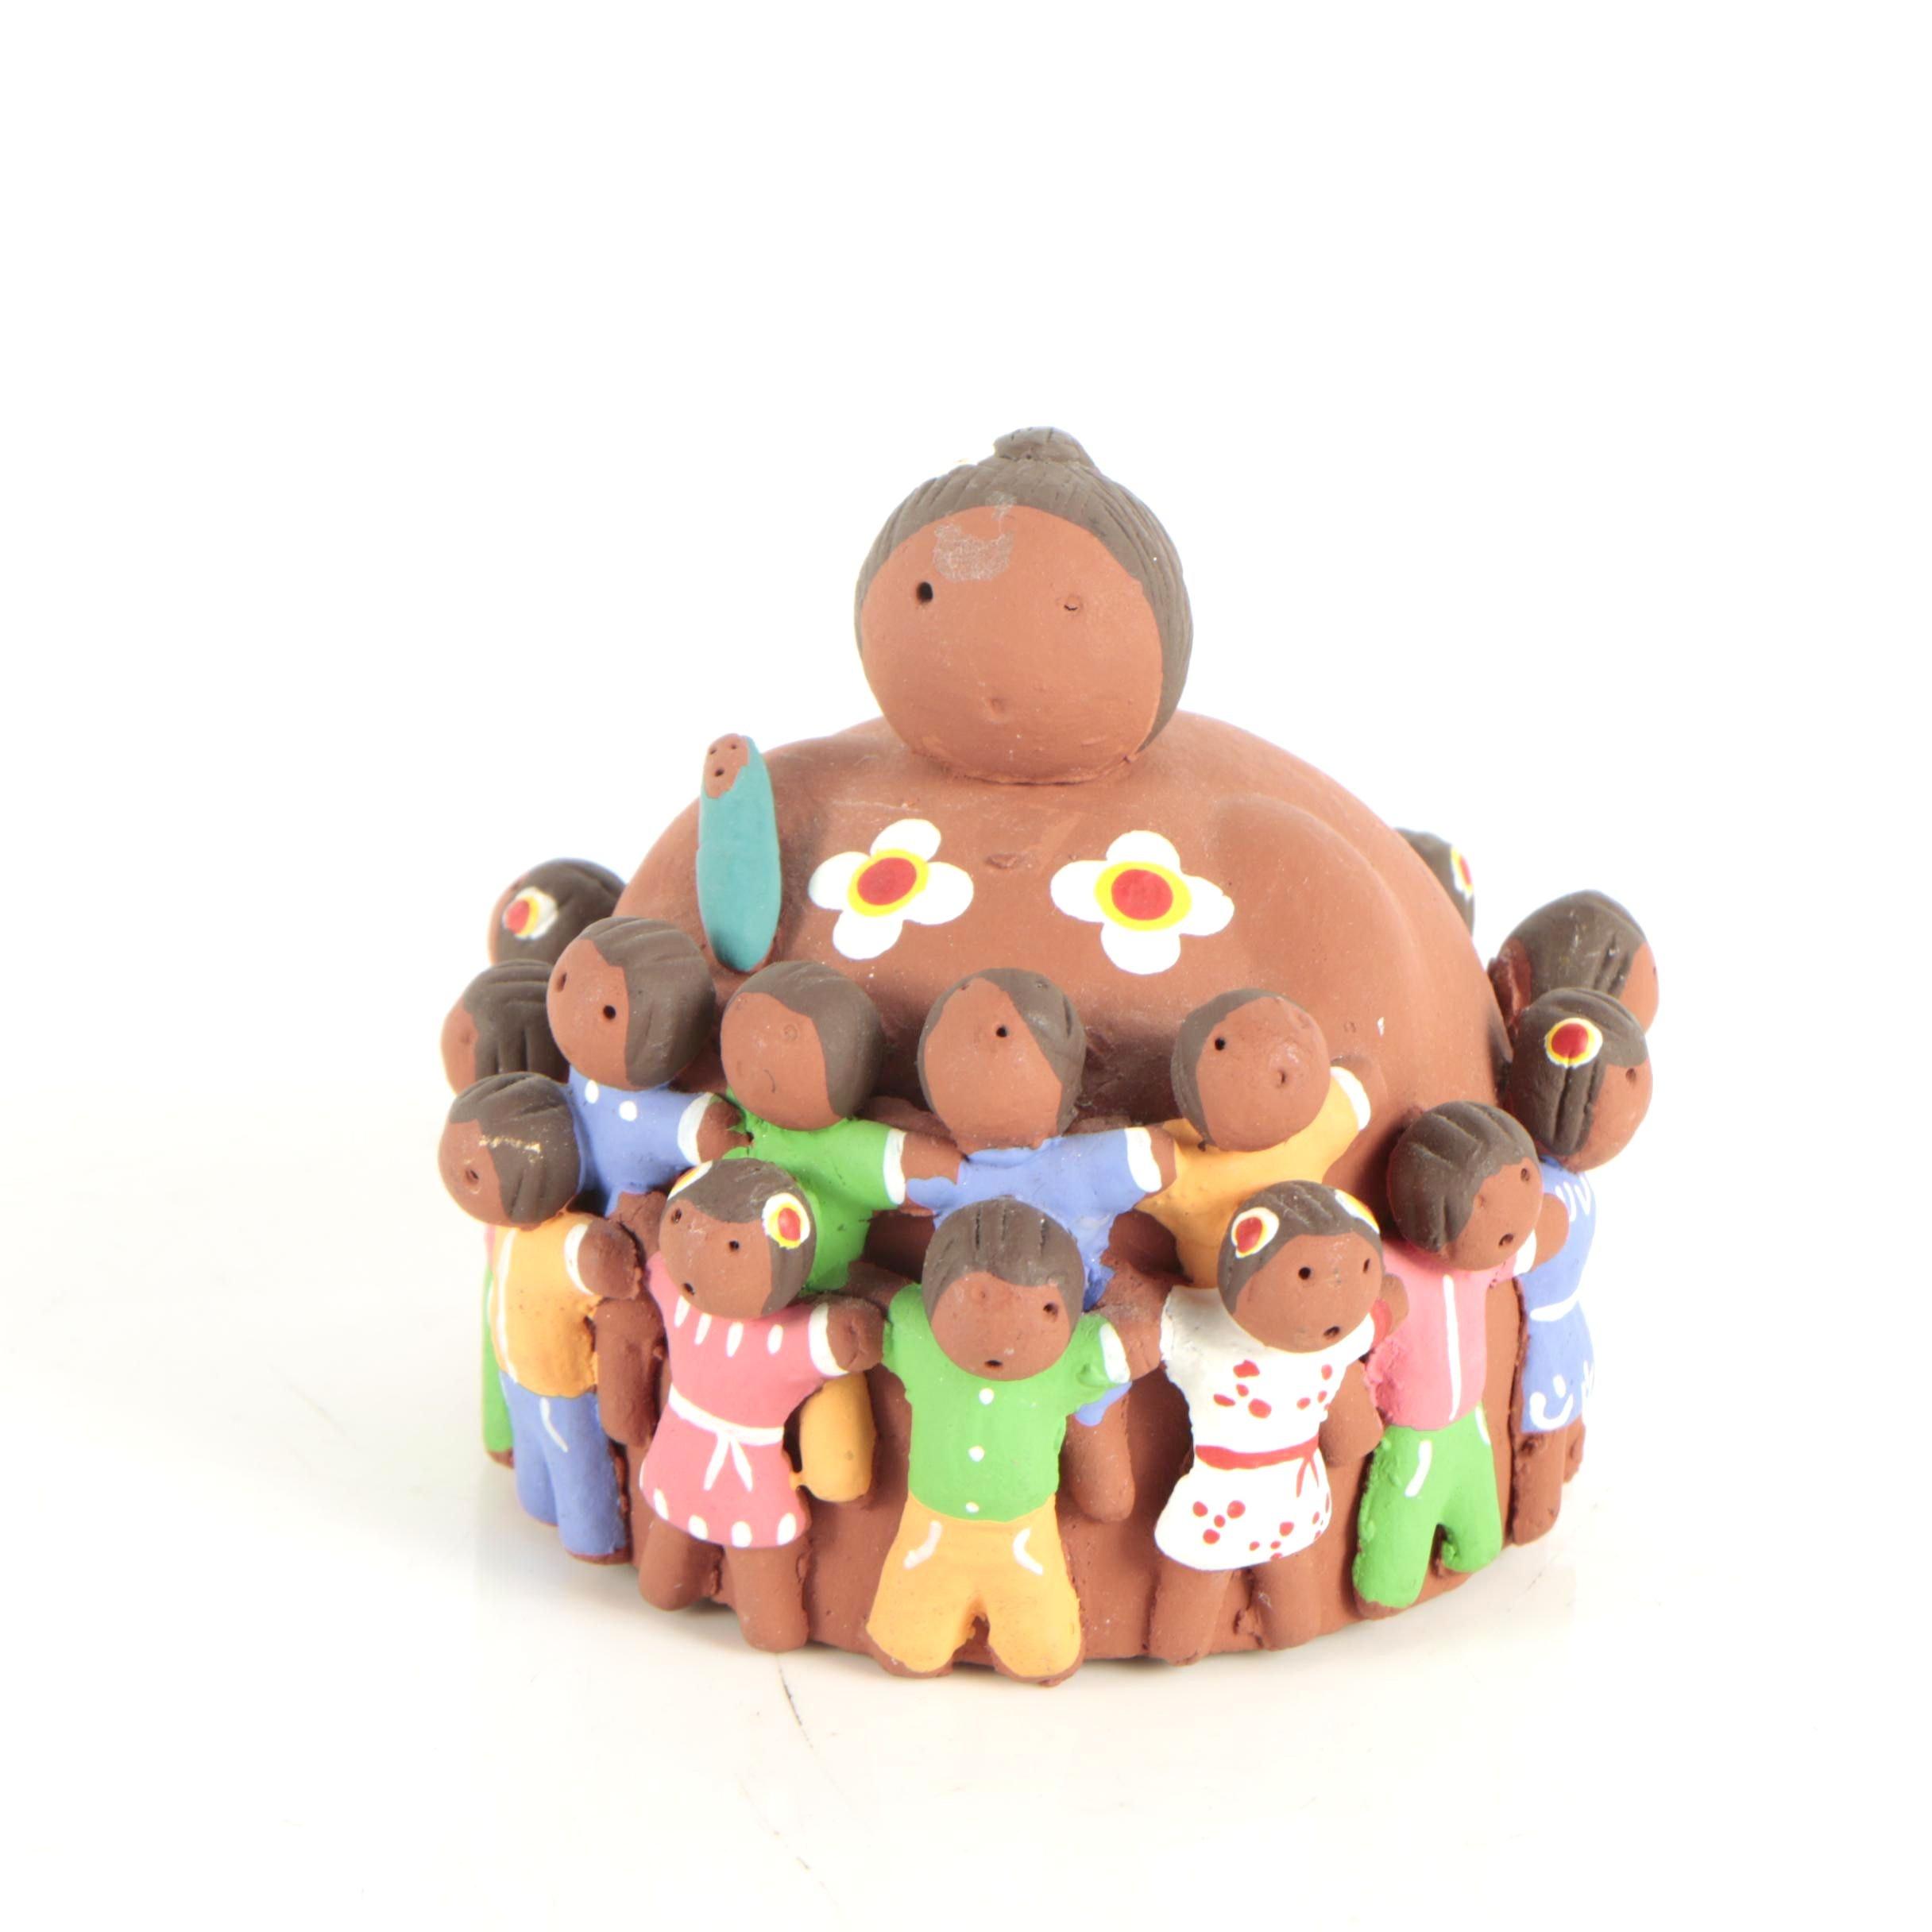 Handbuilt Central American Storyteller Figurine